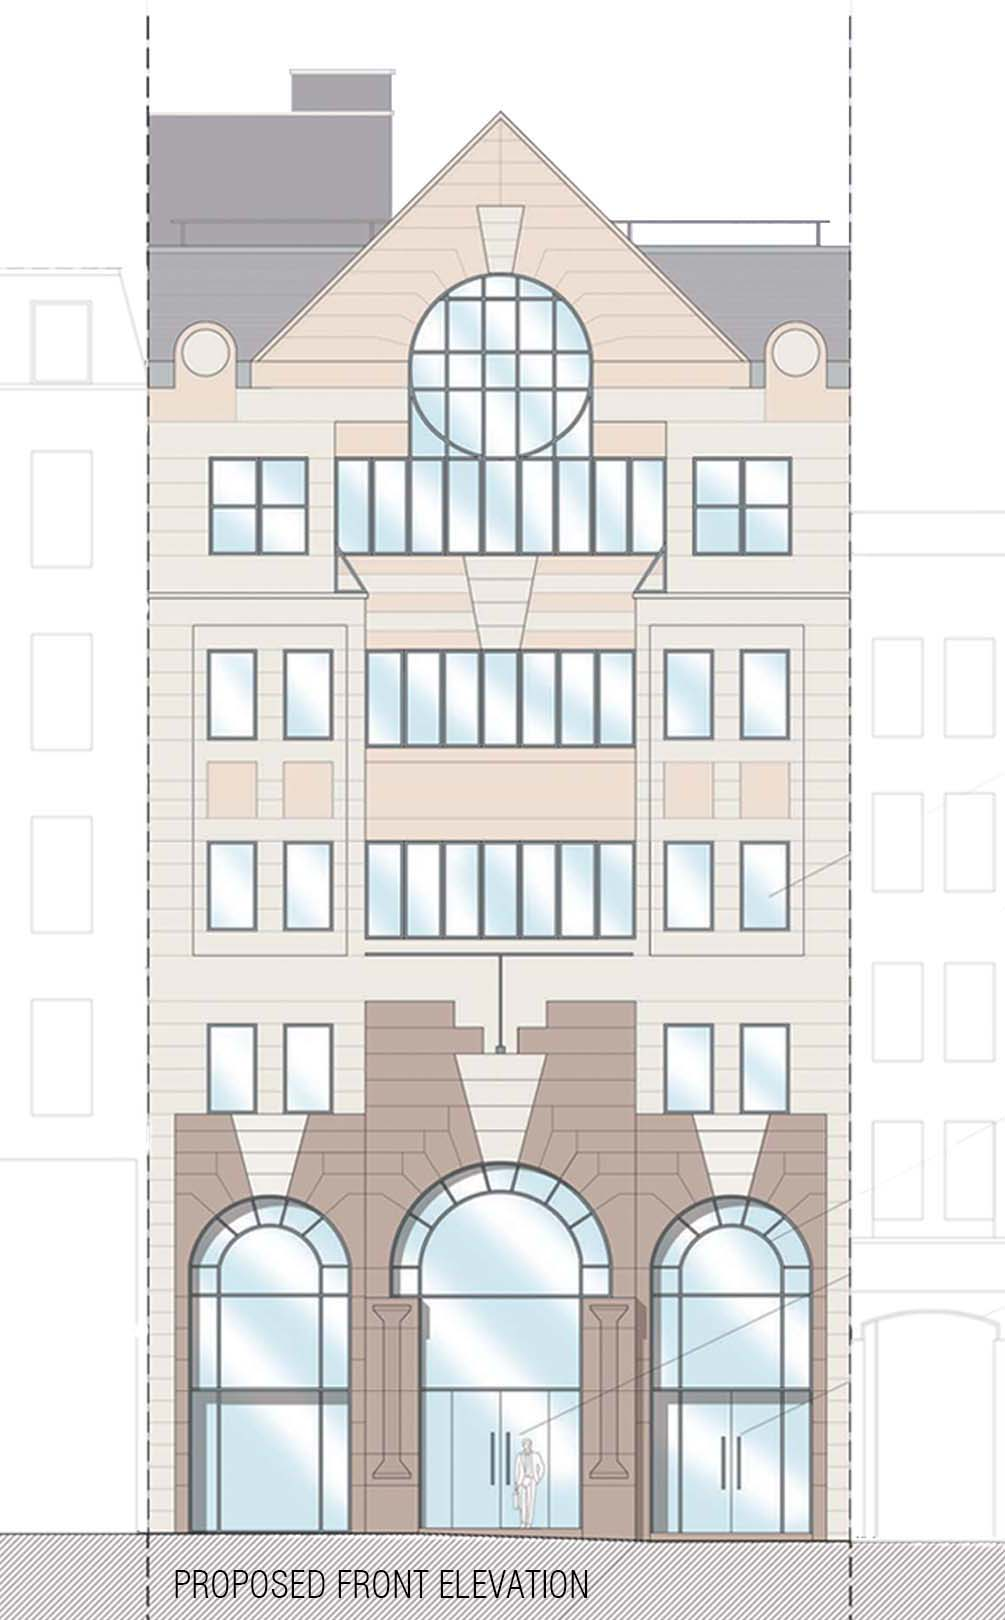 Front Elevation Planning Permission : Alterations to front elevation drawing and planning